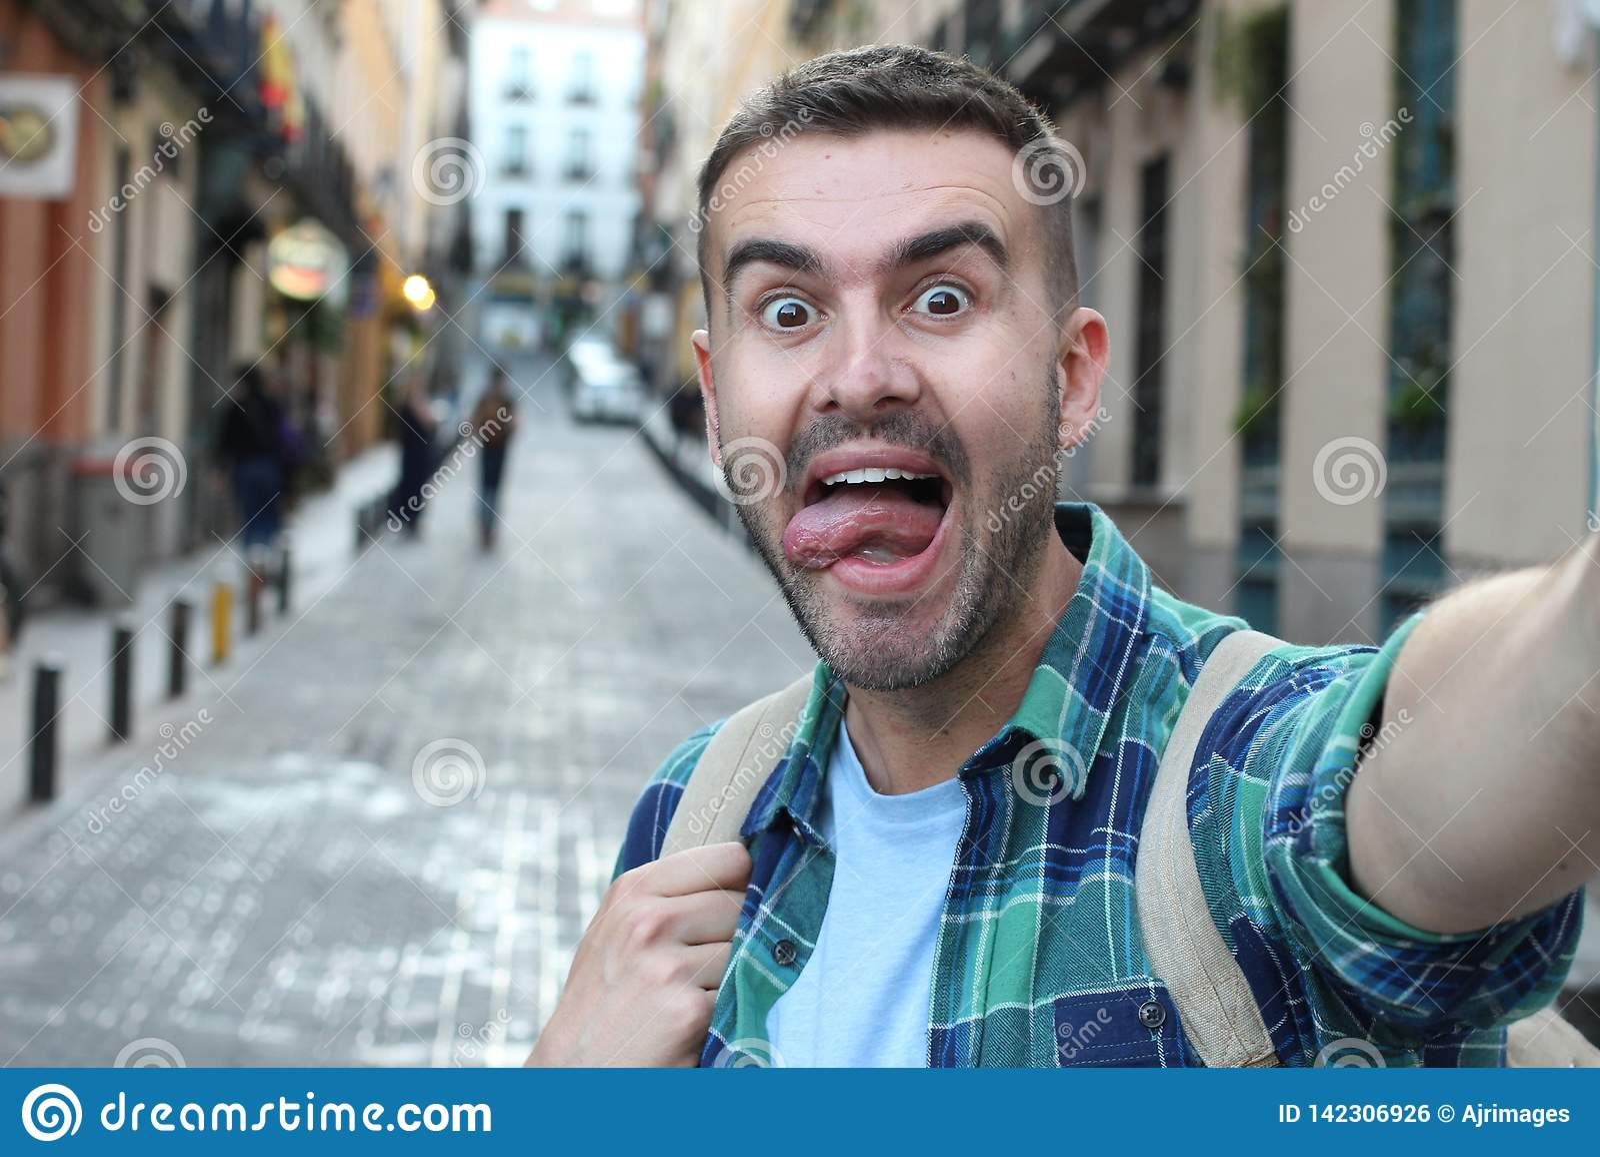 Ecstatic man taking a selfie outdoors